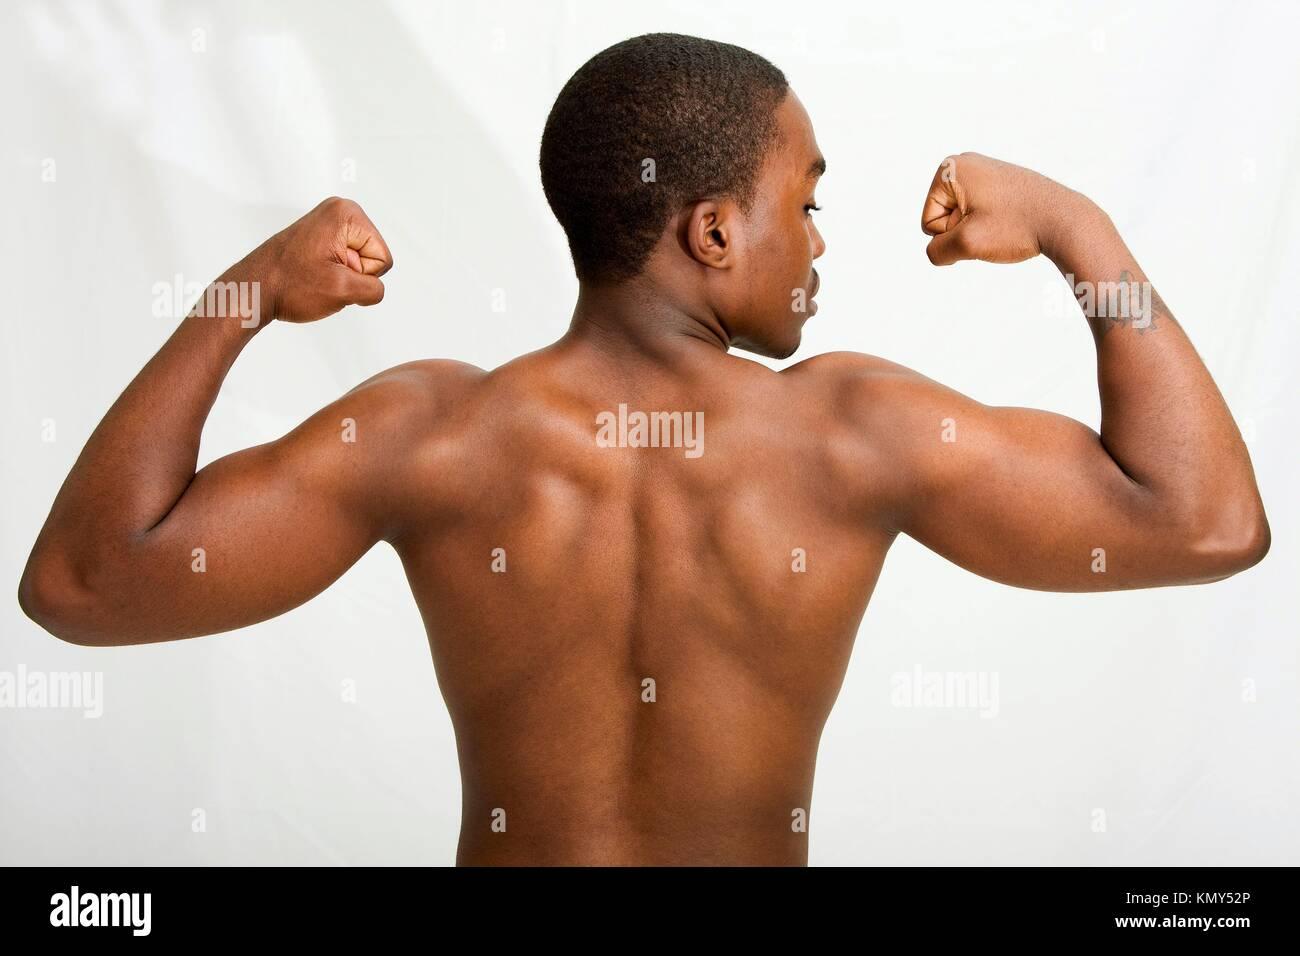 Back Muscle Stockfotos & Back Muscle Bilder - Alamy